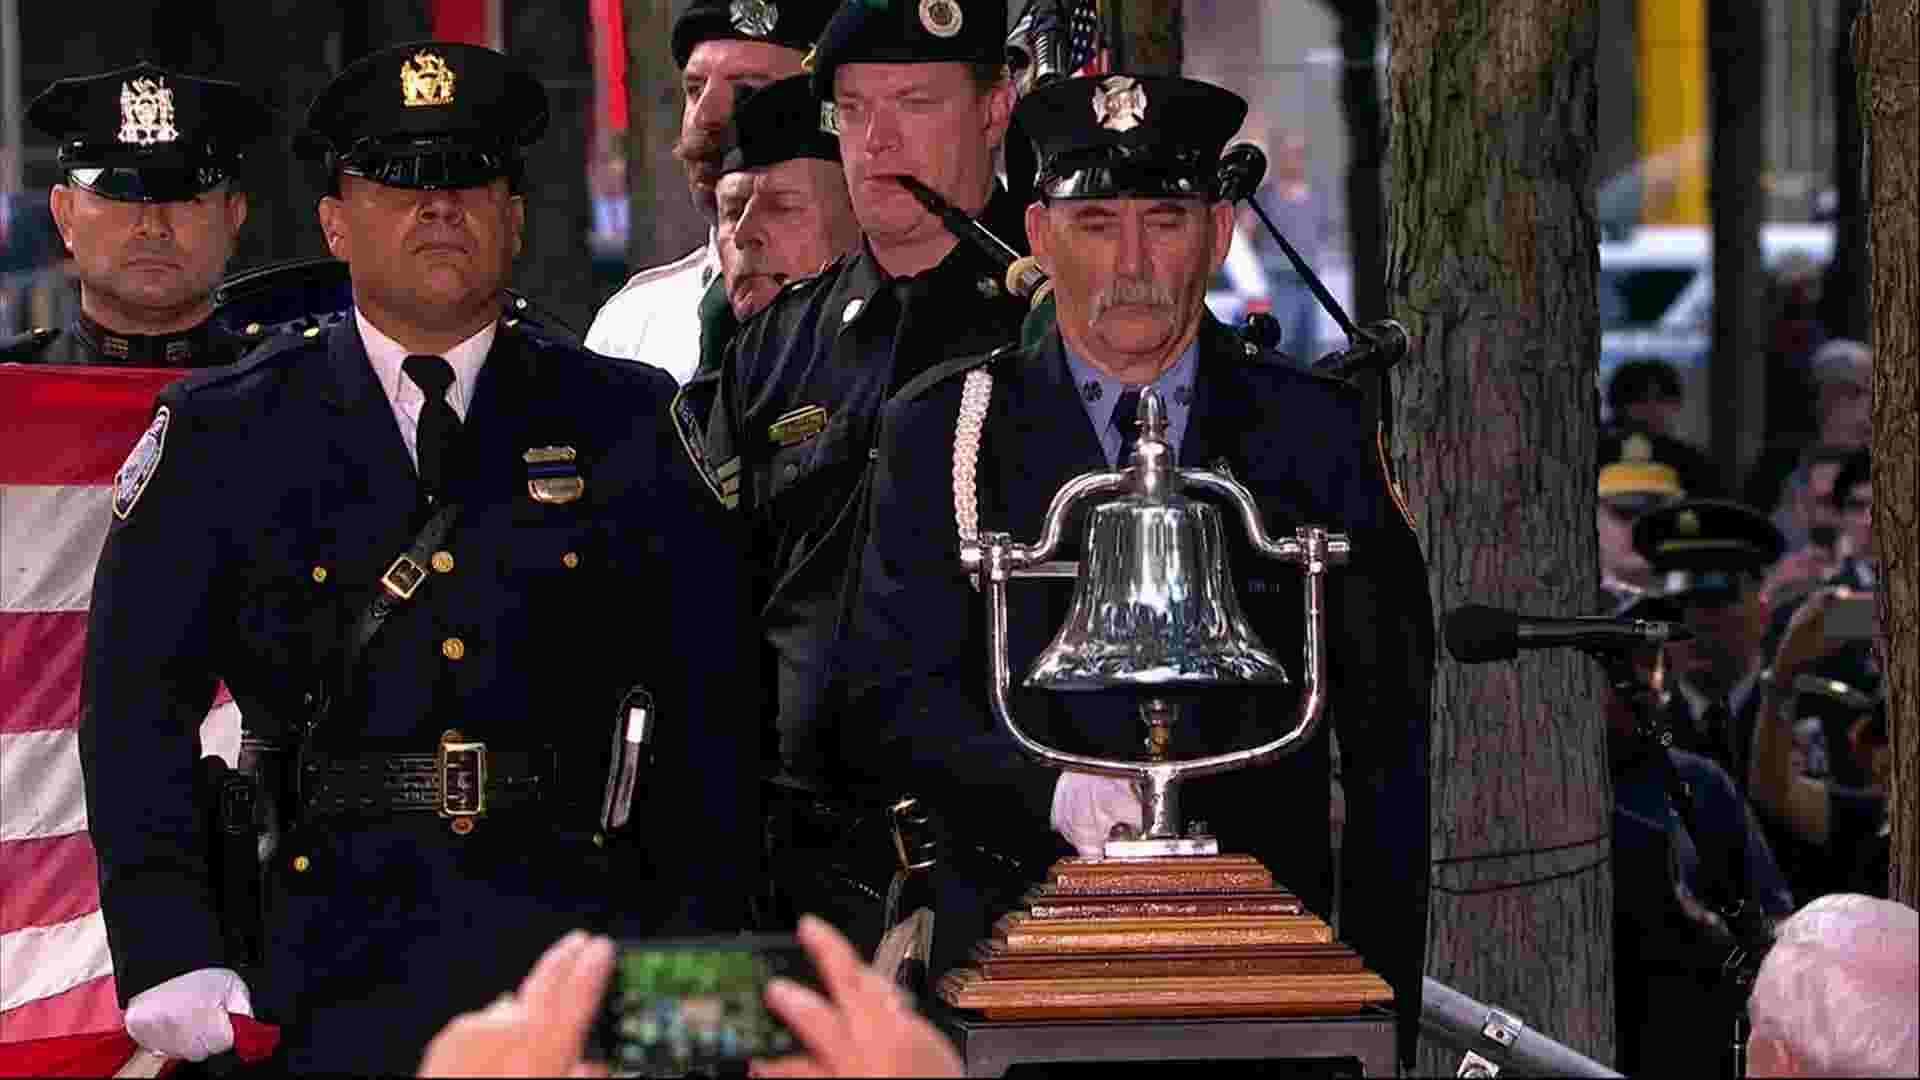 American flag can help us recapture spirit, sacrifice evident after 9/11 attacks, pastor says